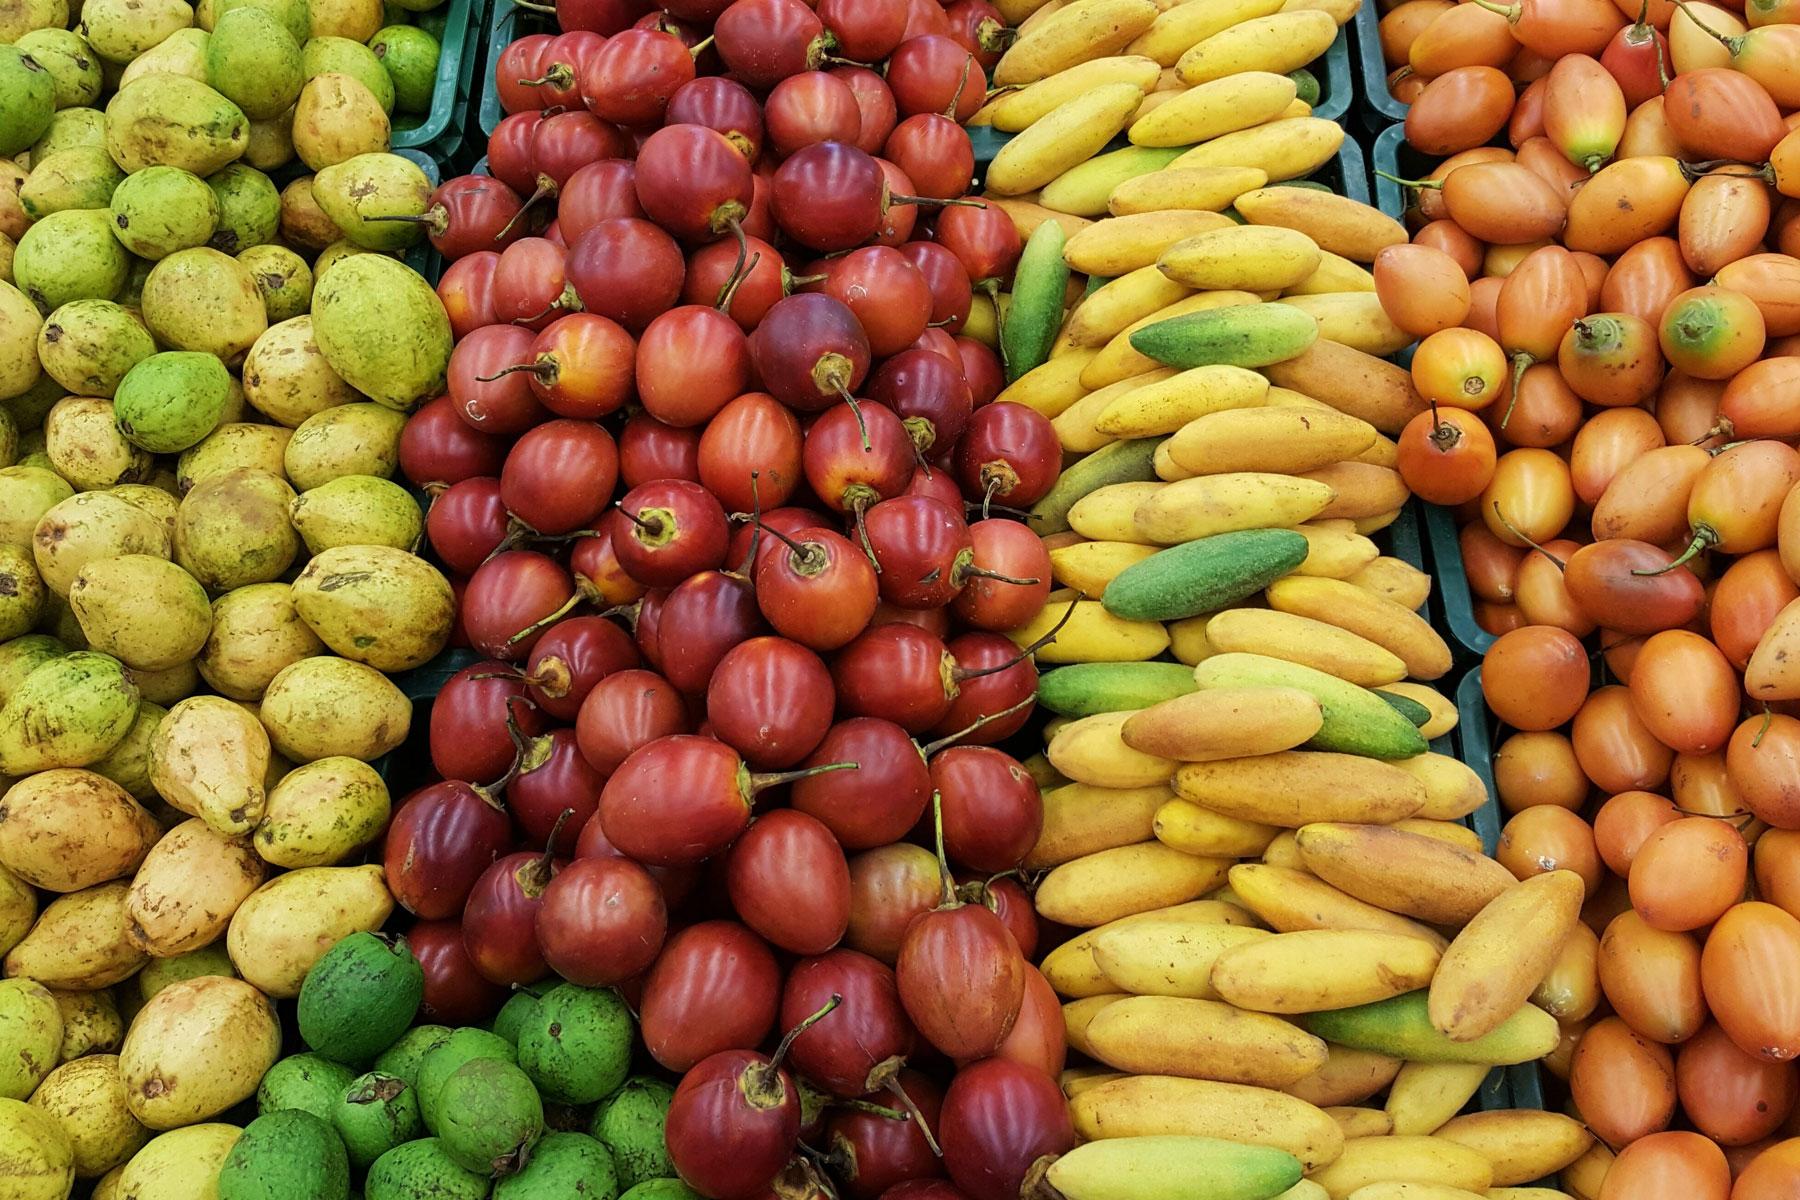 Cultivando Futuro: Smart agriculture in Colombia with Darío Gonzalez